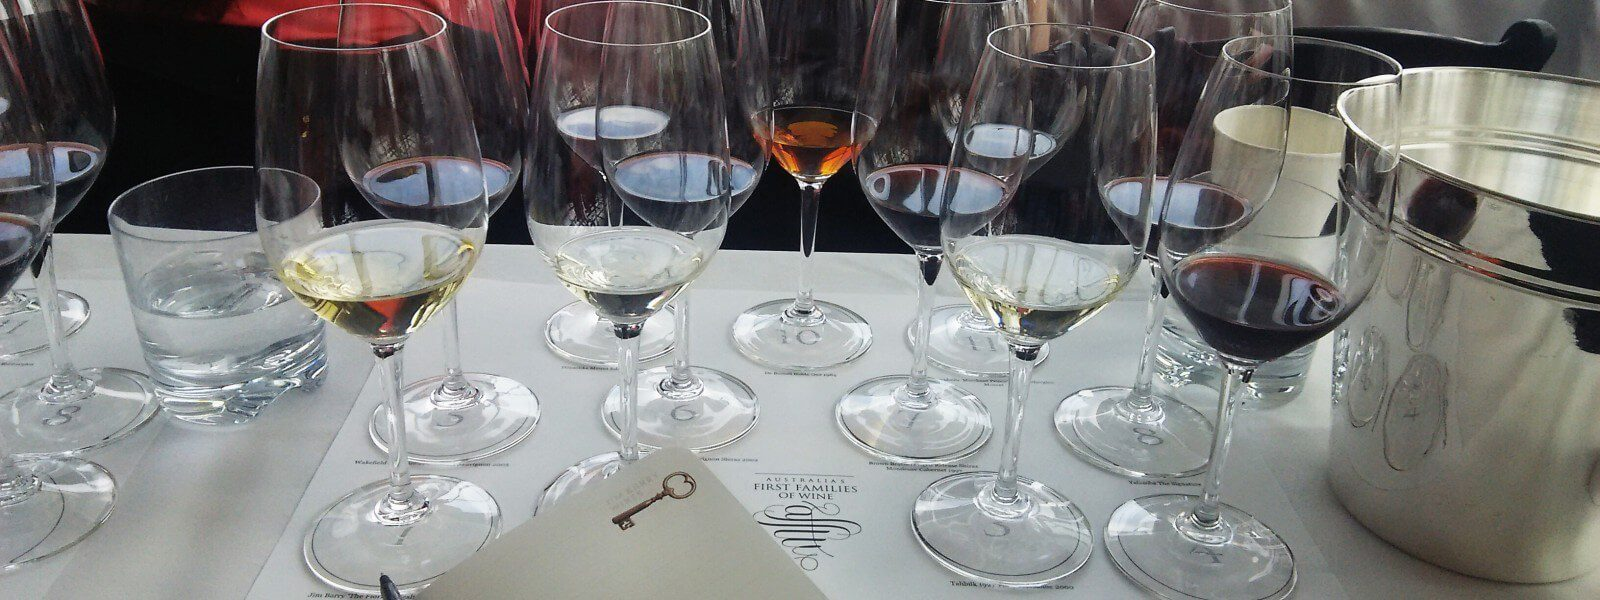 Wine glasses set up for a tasting at Press.